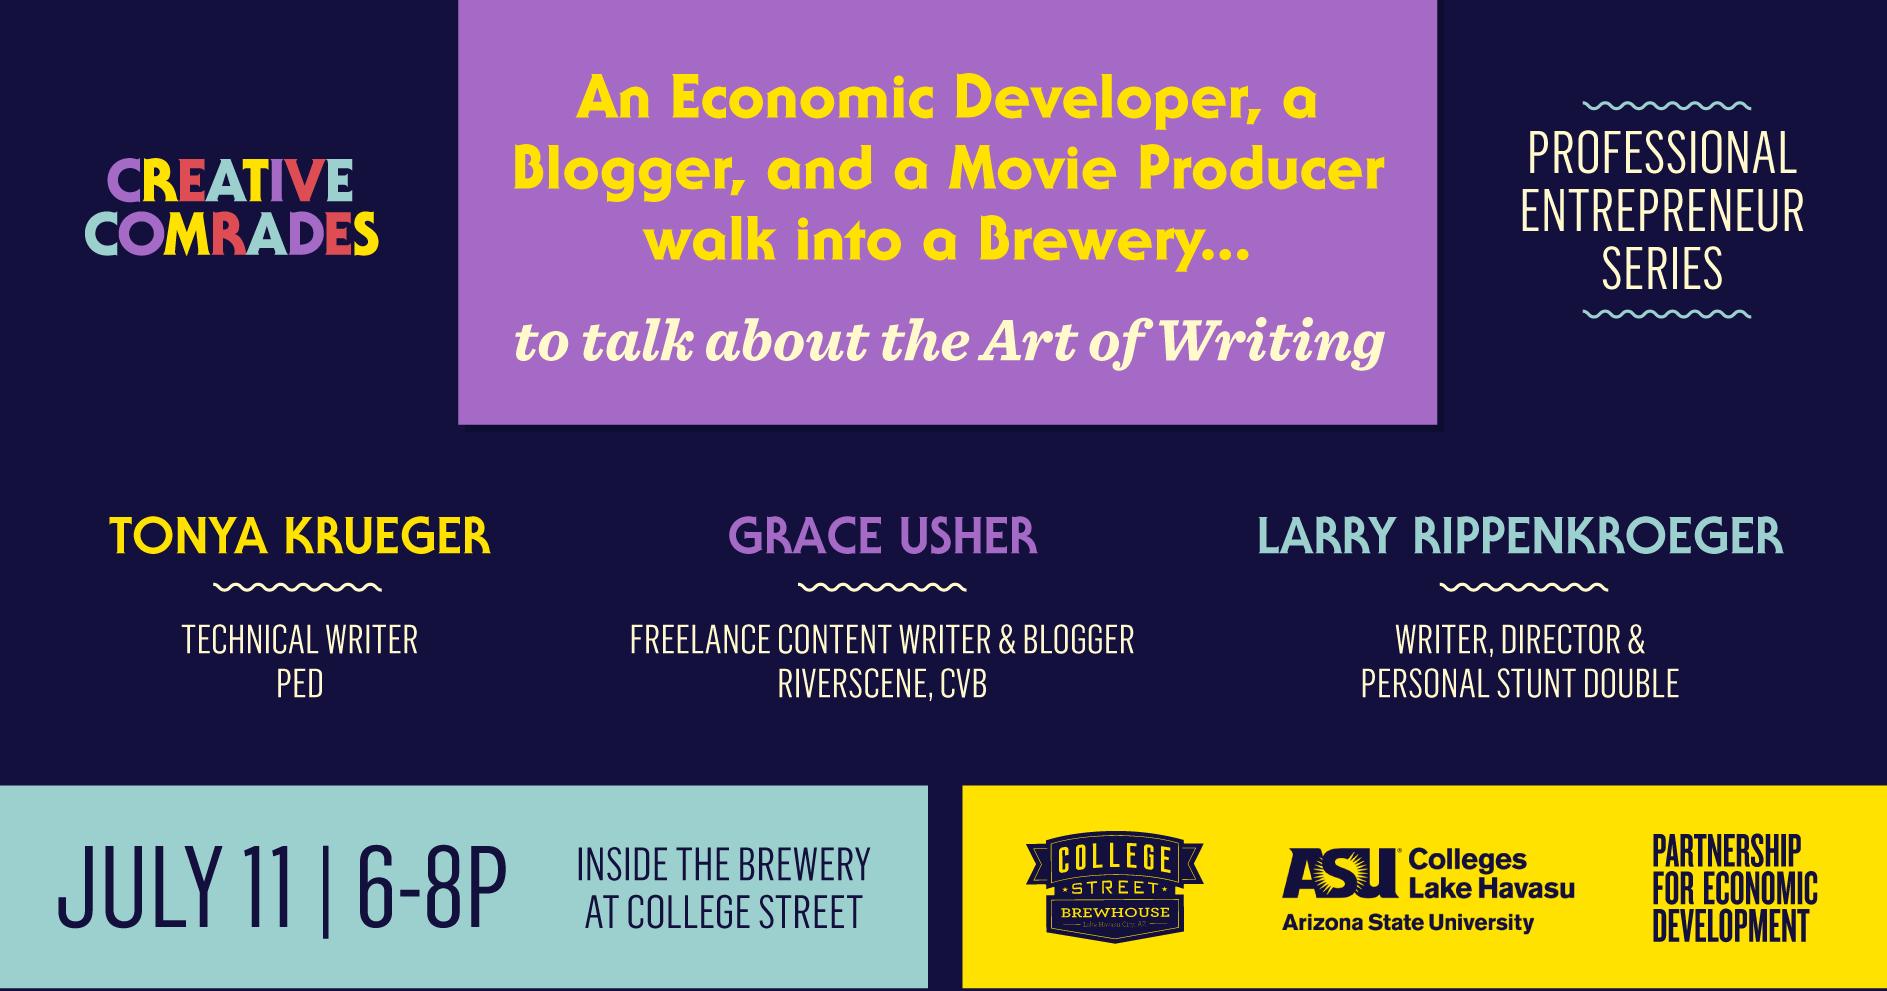 Creative Comrades July | The Art of Writing